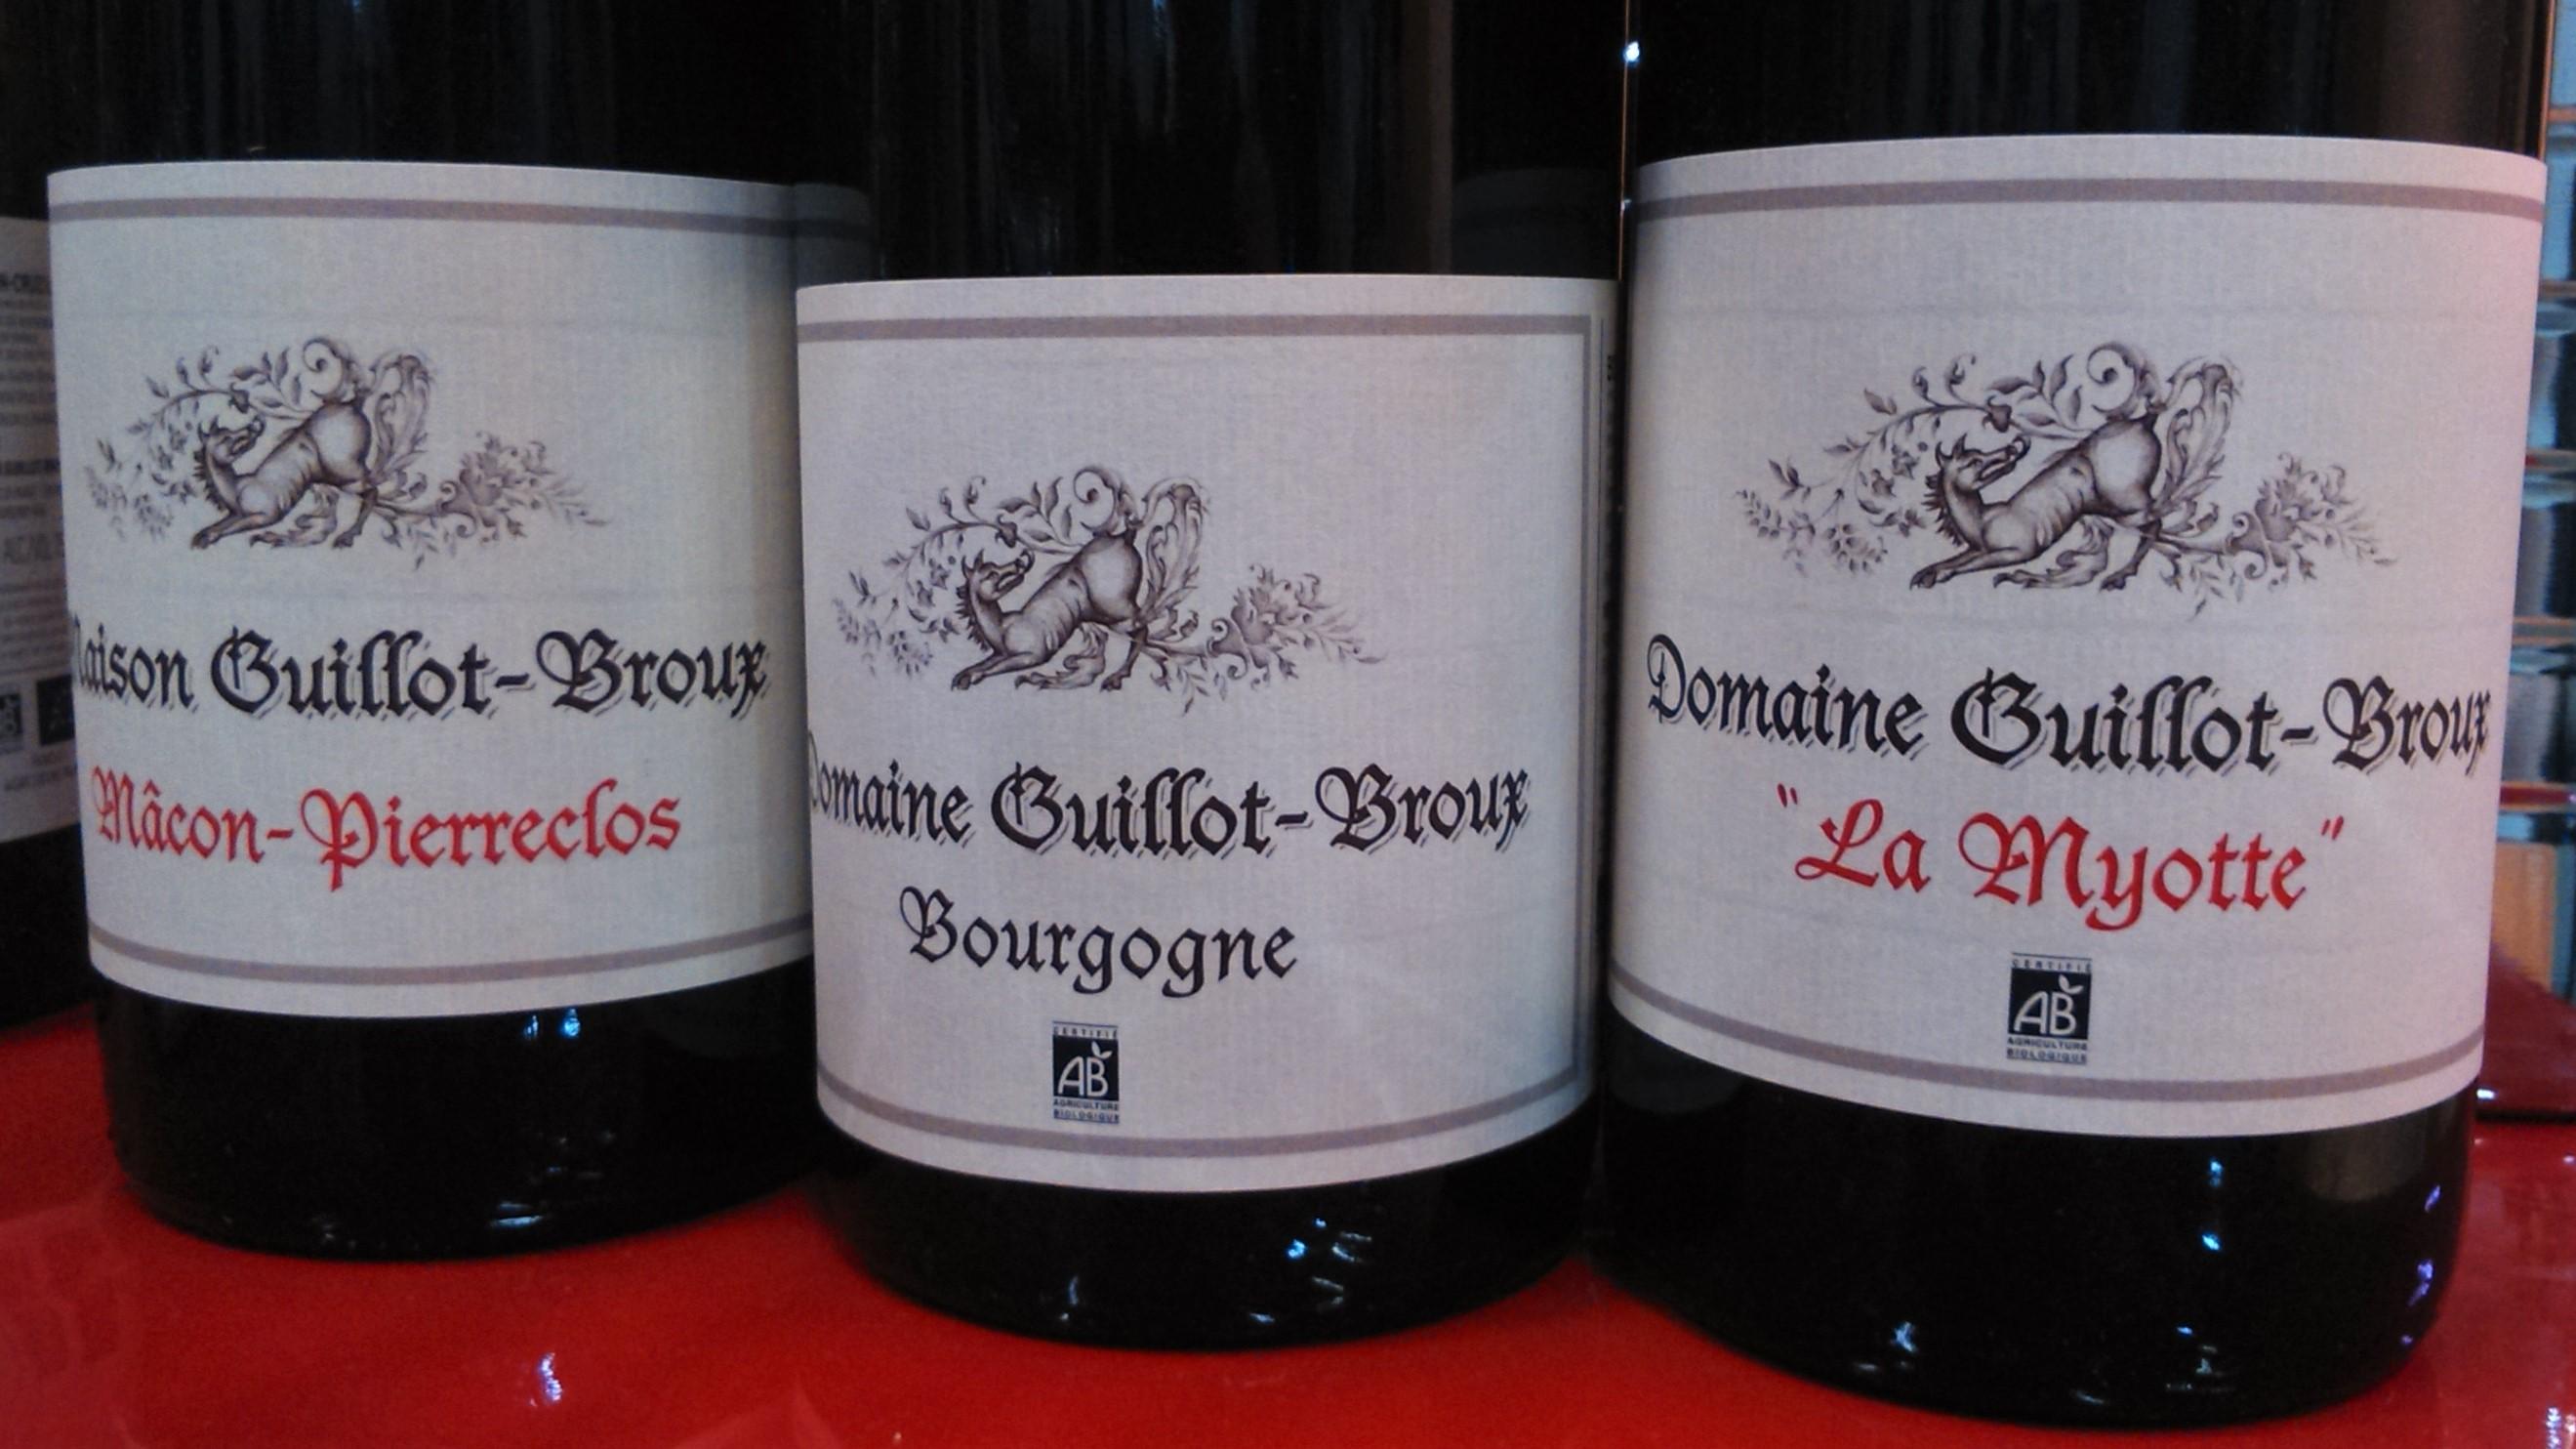 Guillot-Broux